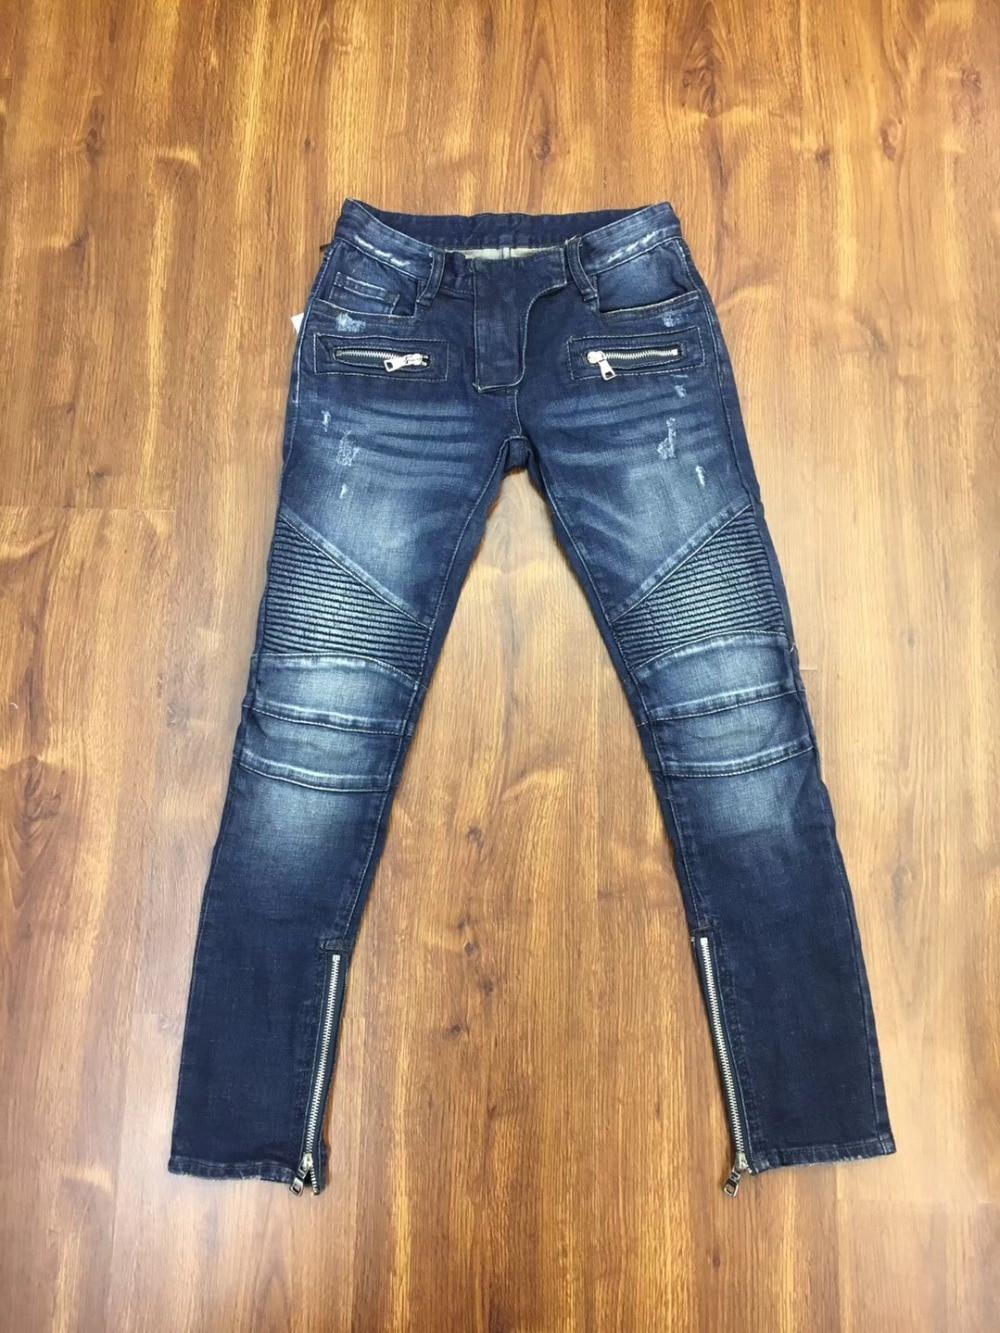 2019 New luxury CosMaMa Brand designer fashion zippers all denim skinny fit pleated biker jeans boyfriend for women blue